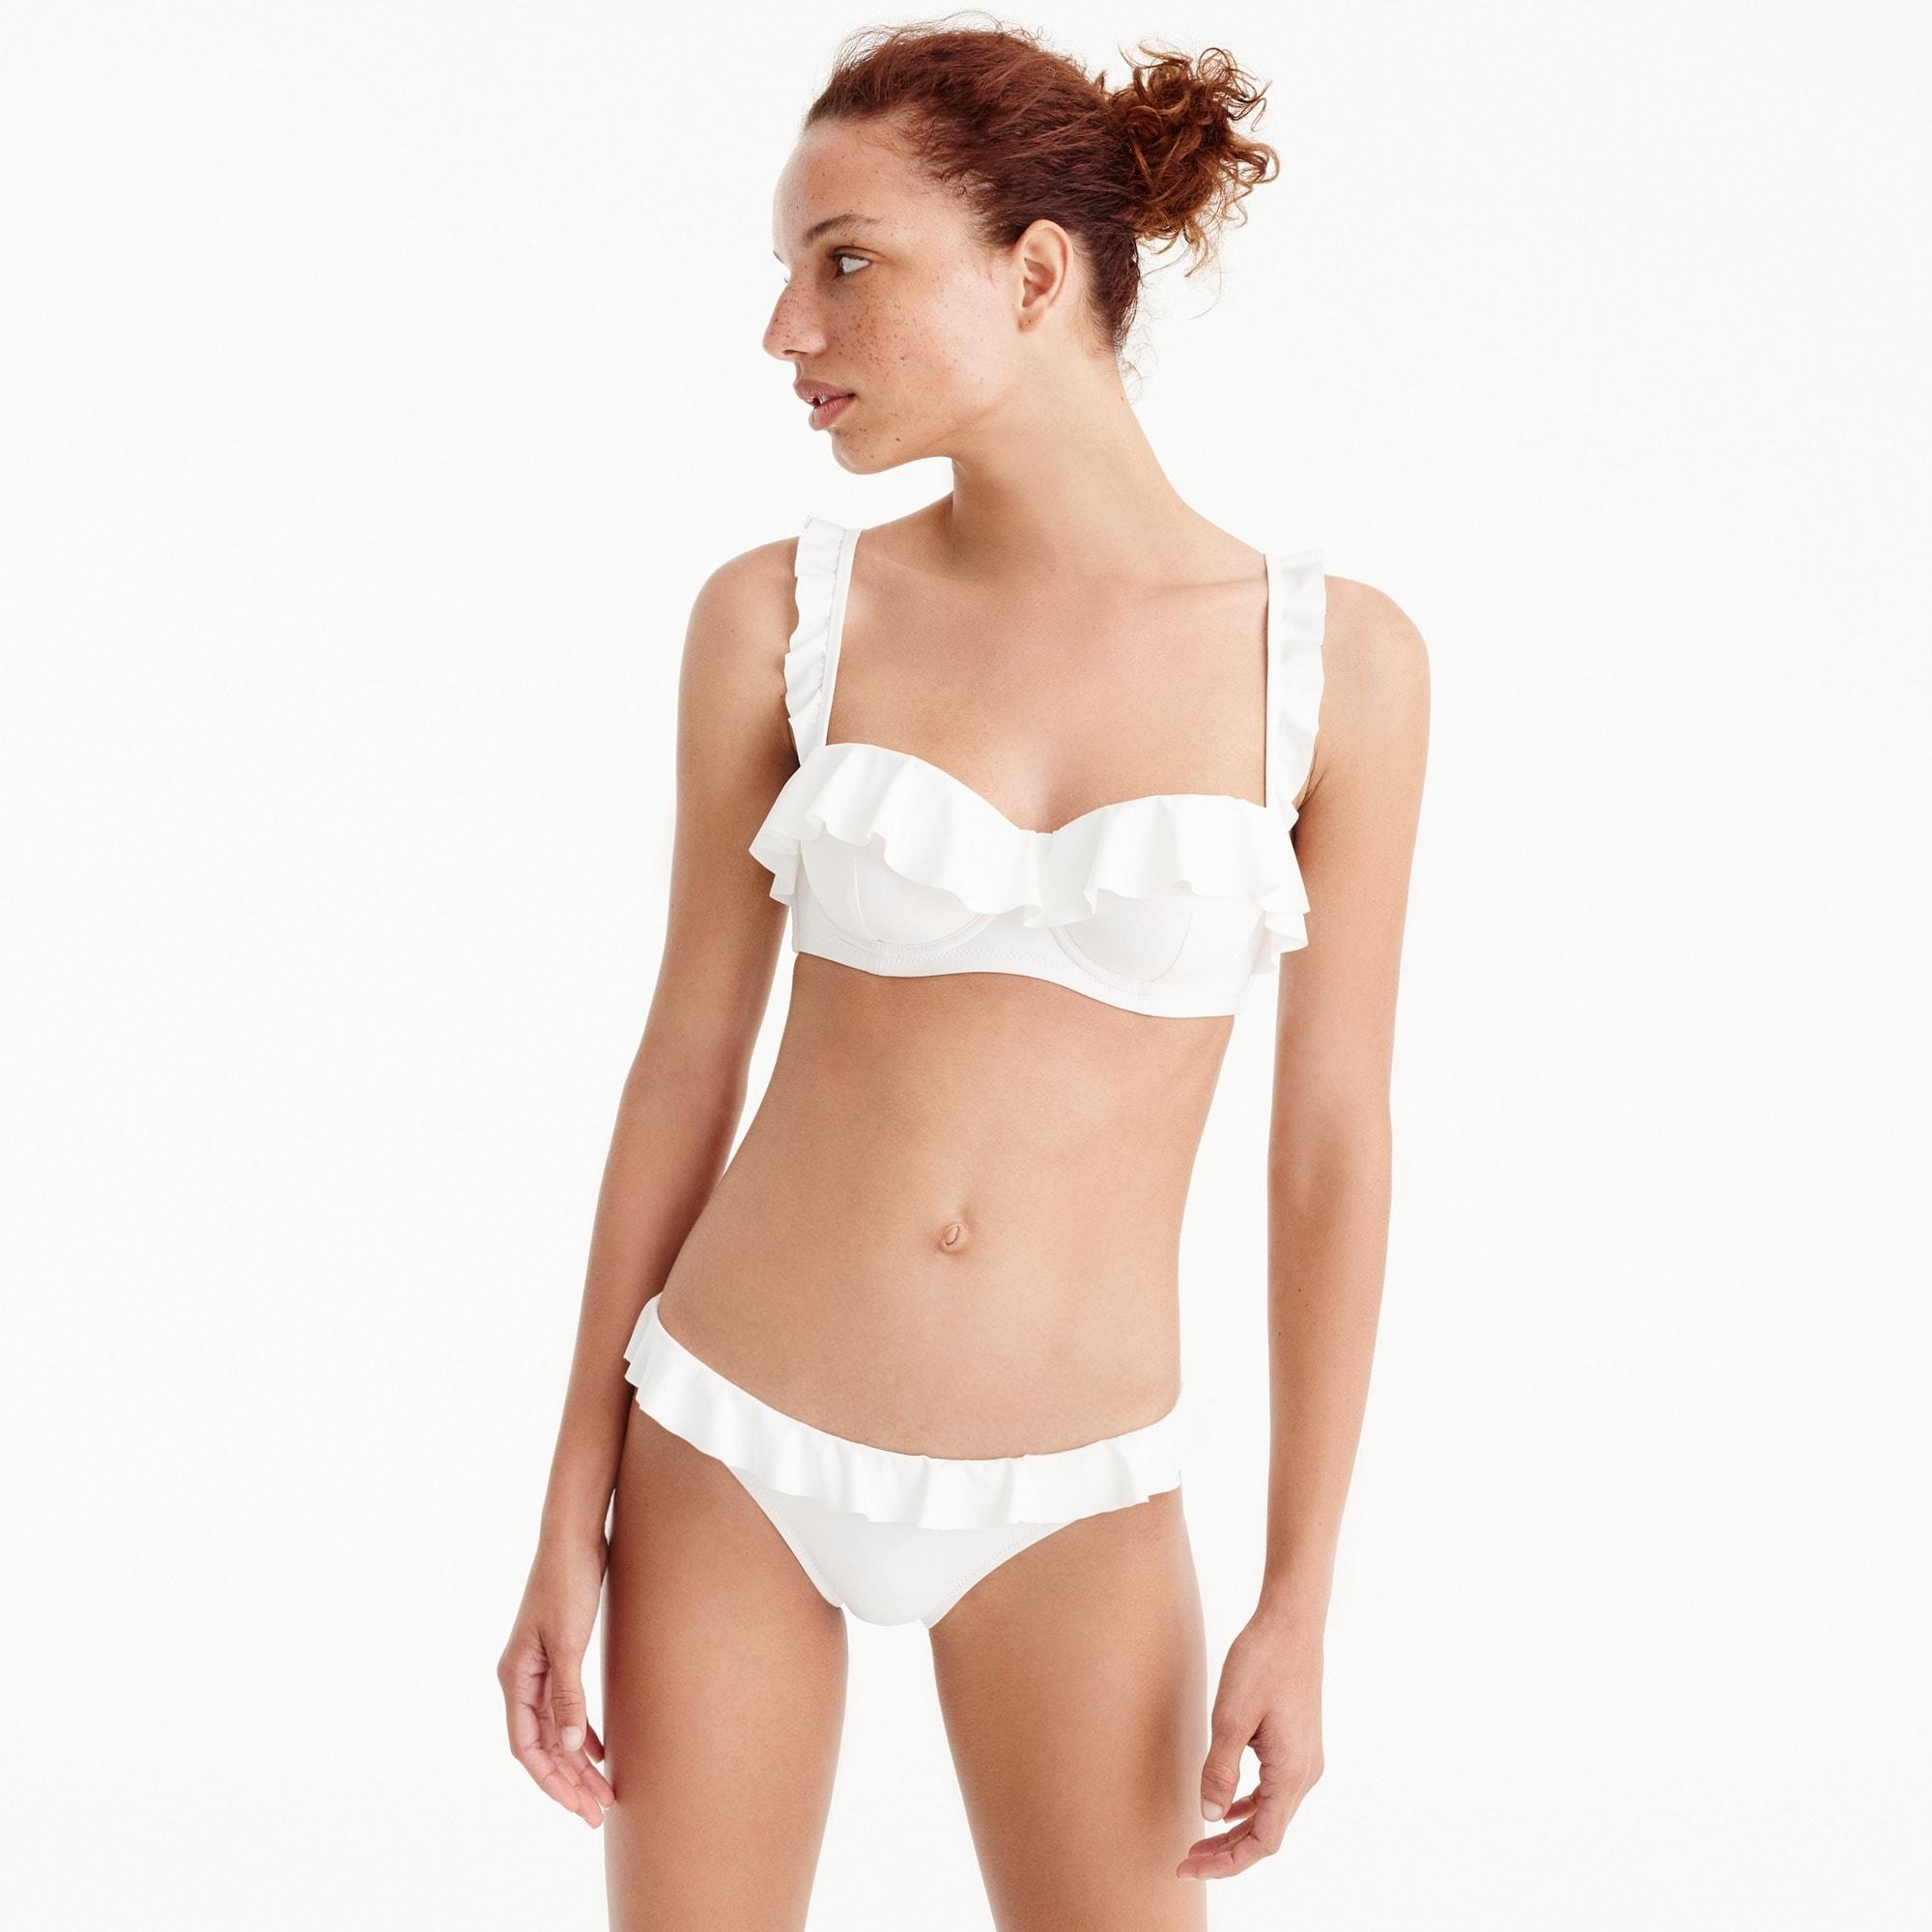 Ruffle underwire bikini top women swim c